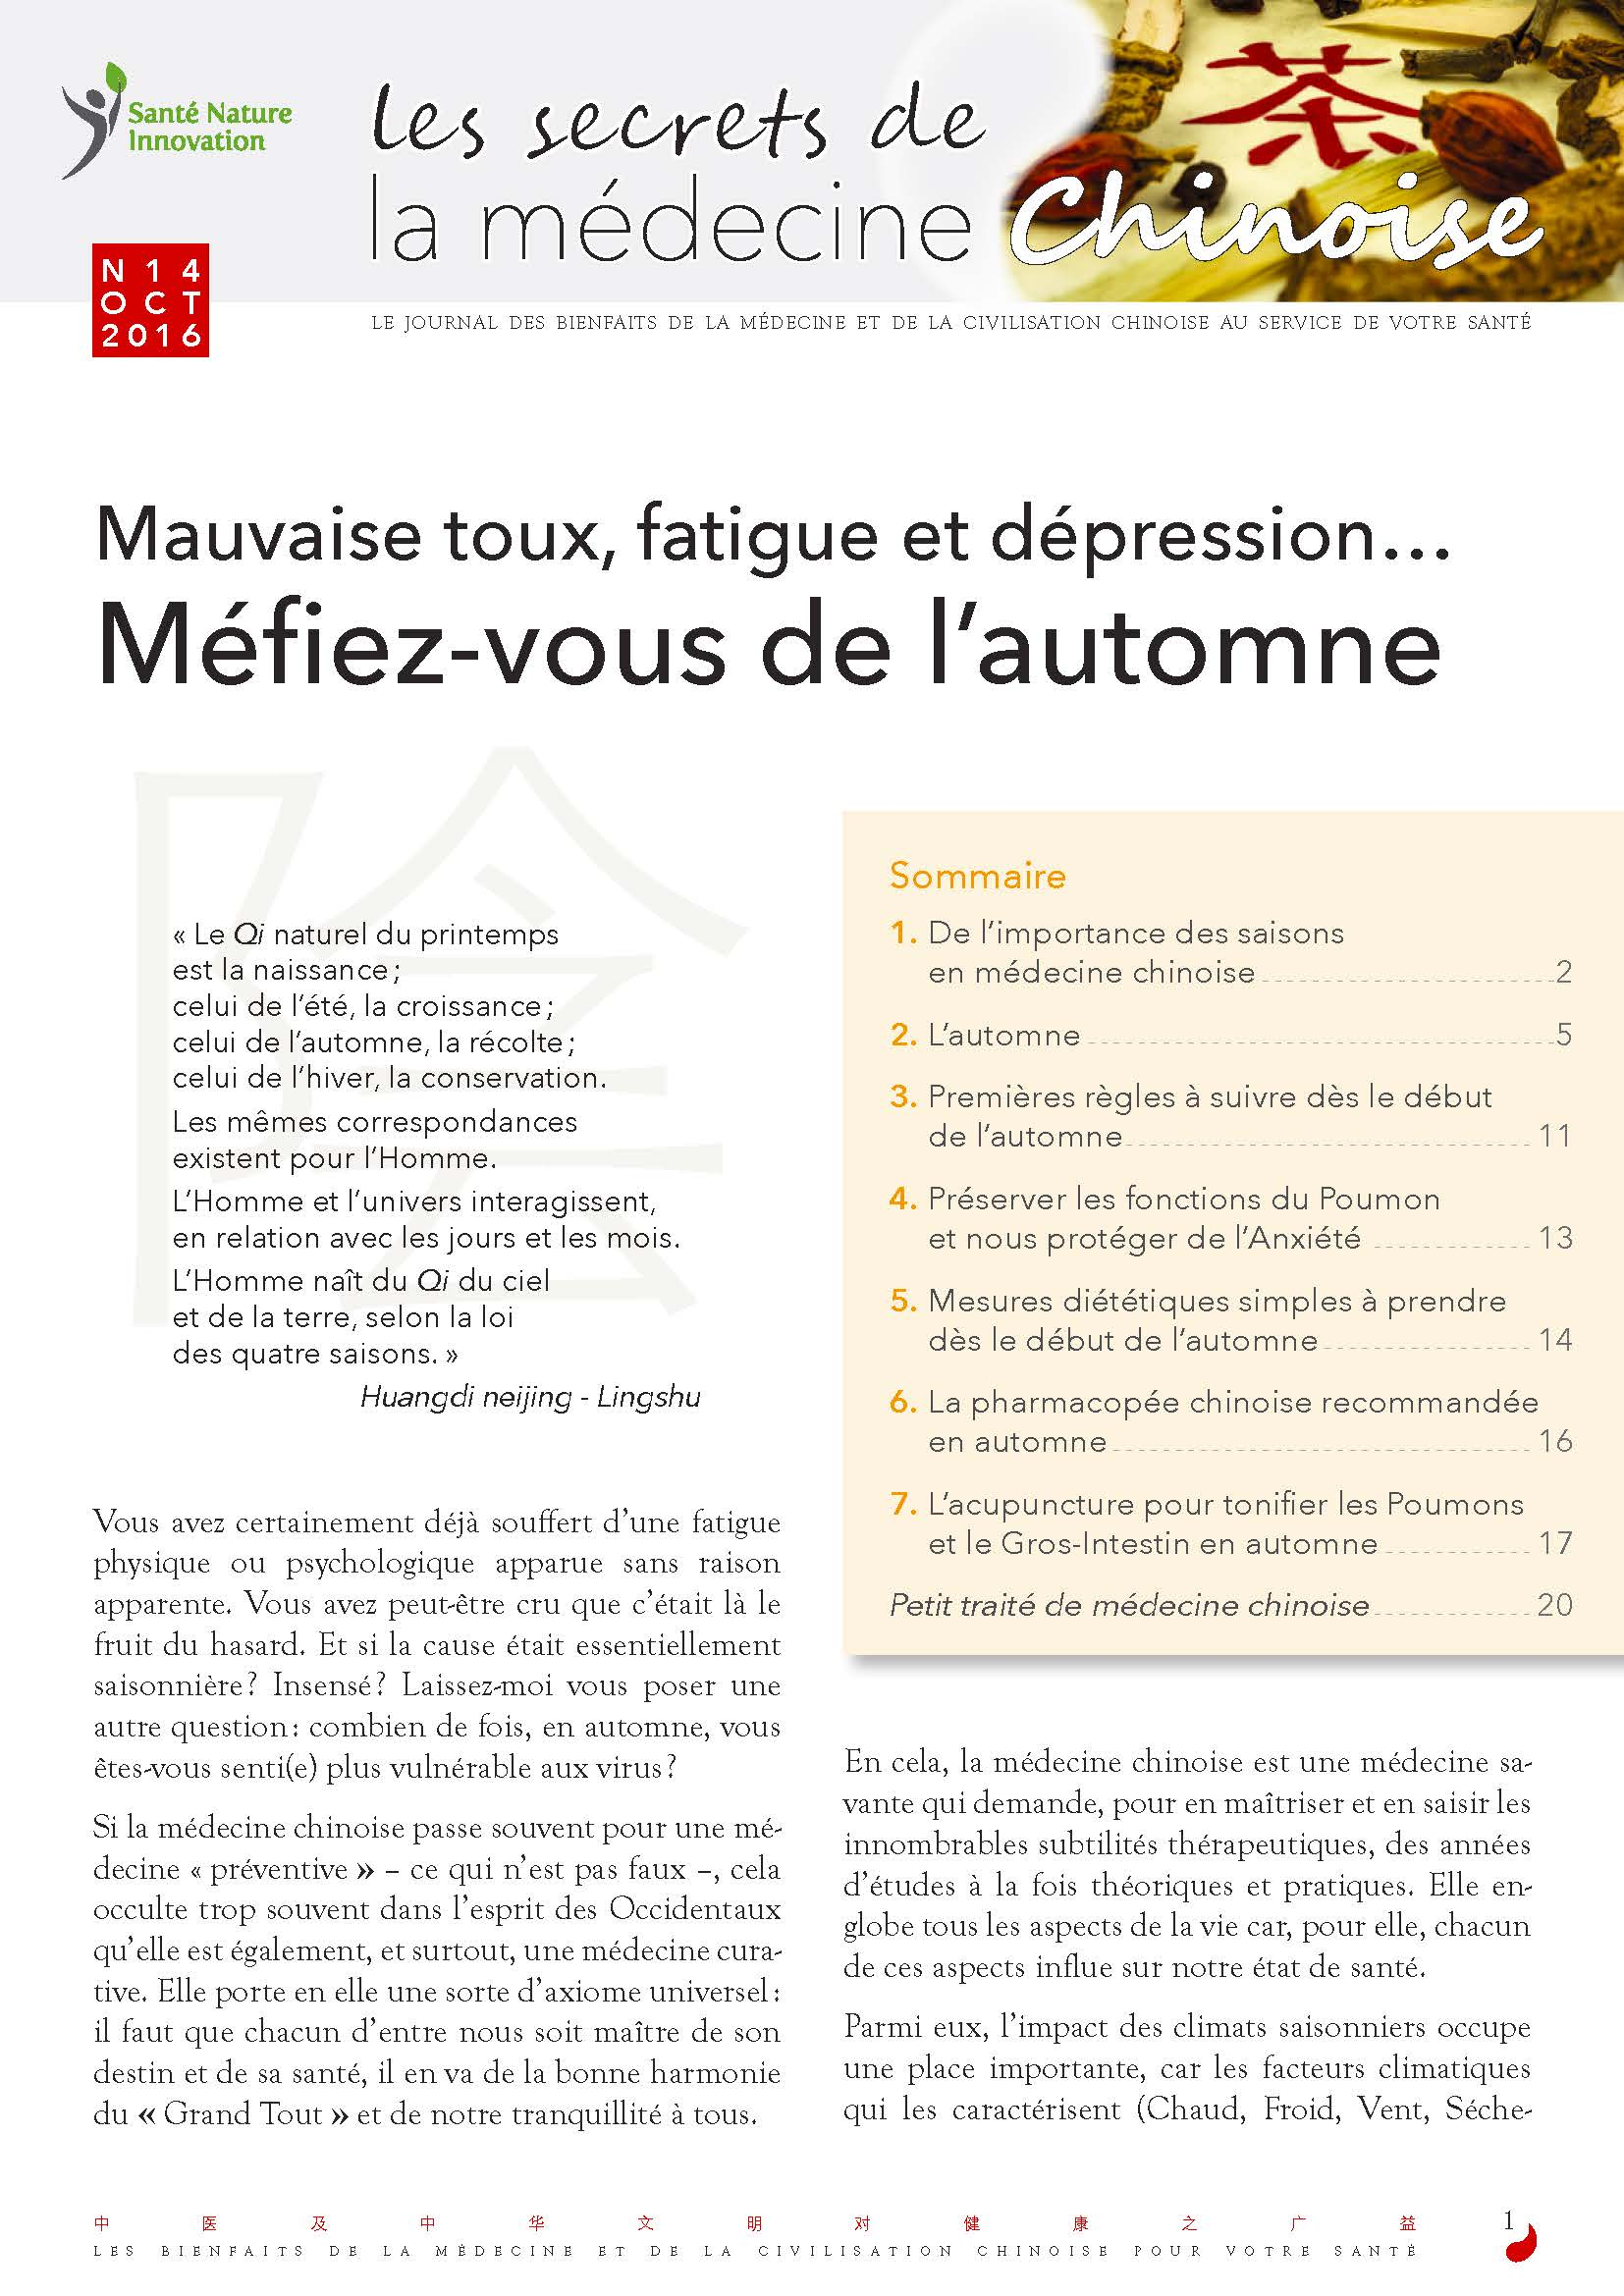 14 - DEPRESSION AUTOMNE 1